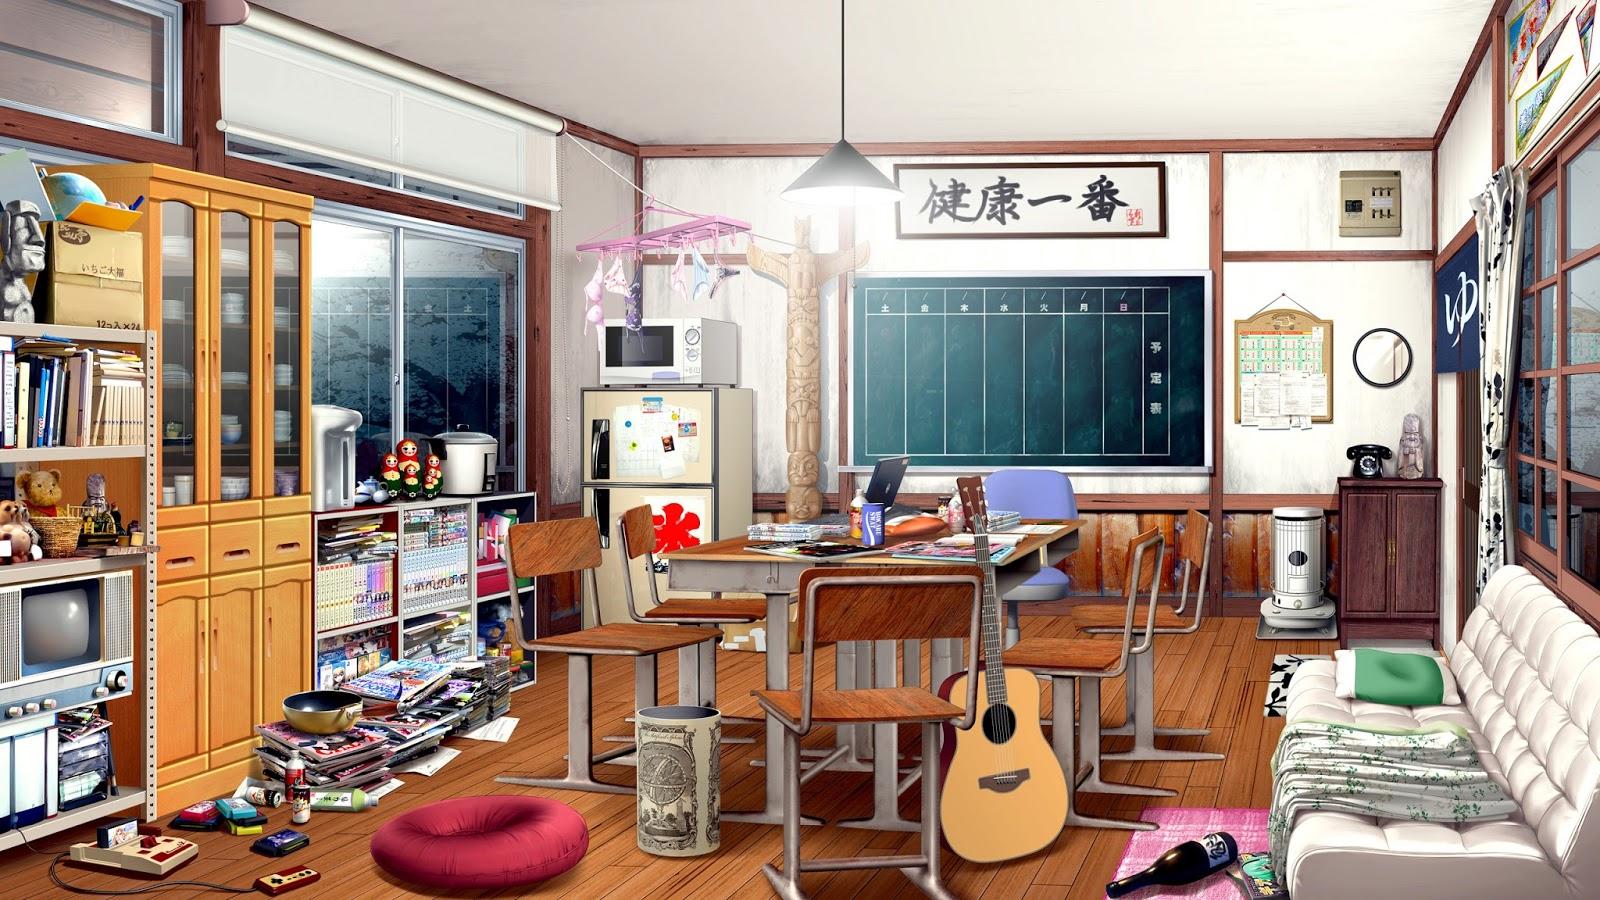 Anime Landscape: Room (Anime Background)